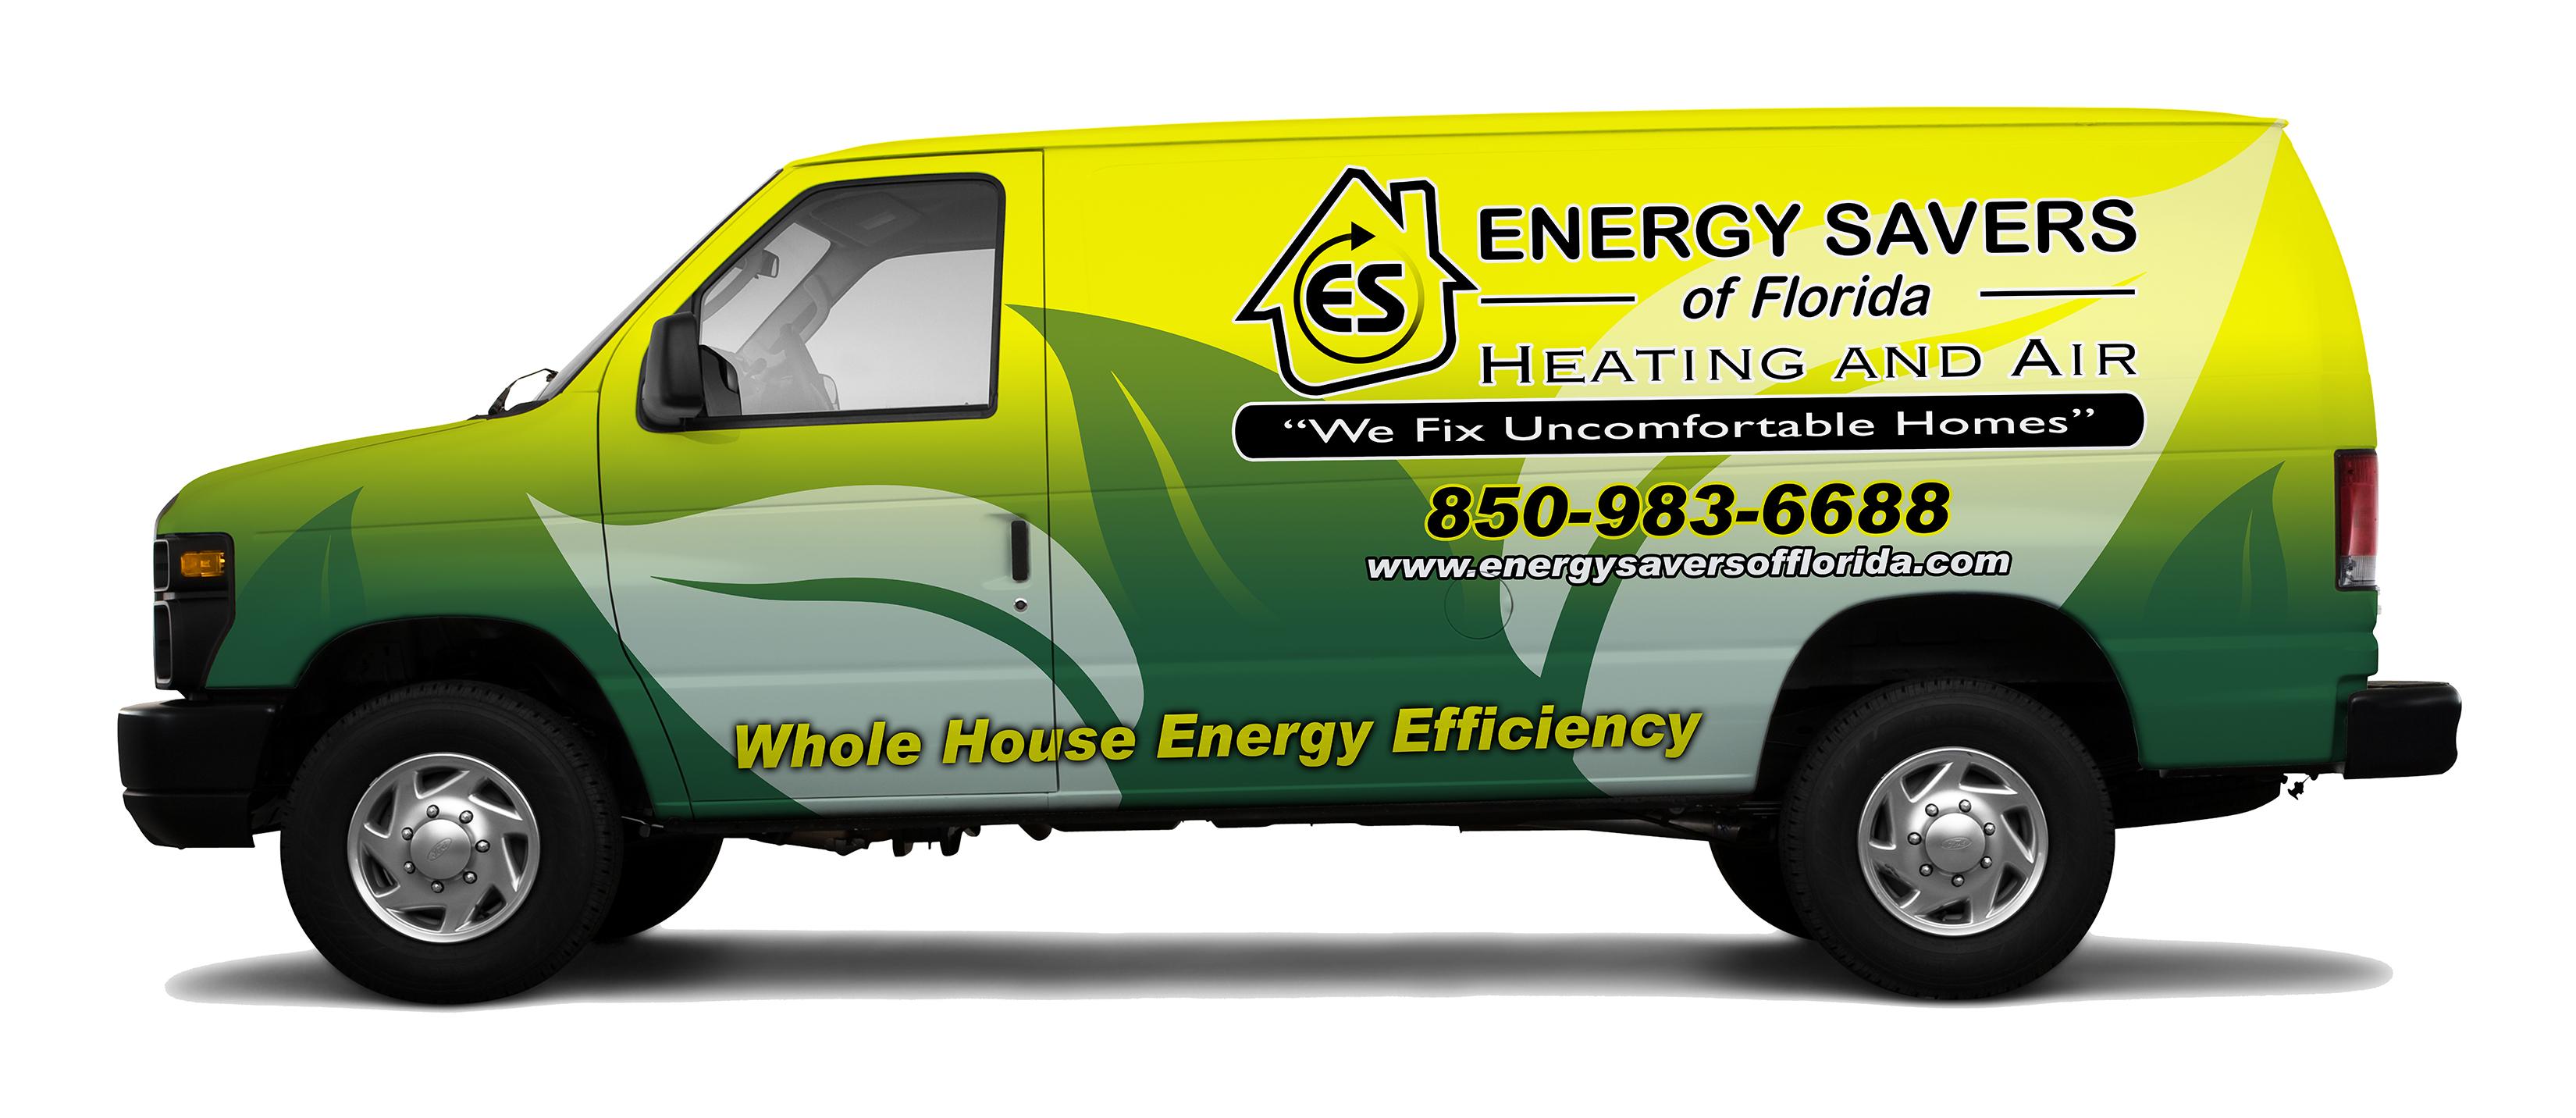 Energy Savers Of Florida Heating and Air Conditioning reviews   Heating & Air Conditioning/HVAC at 616 Elindiea Lane - Milton FL